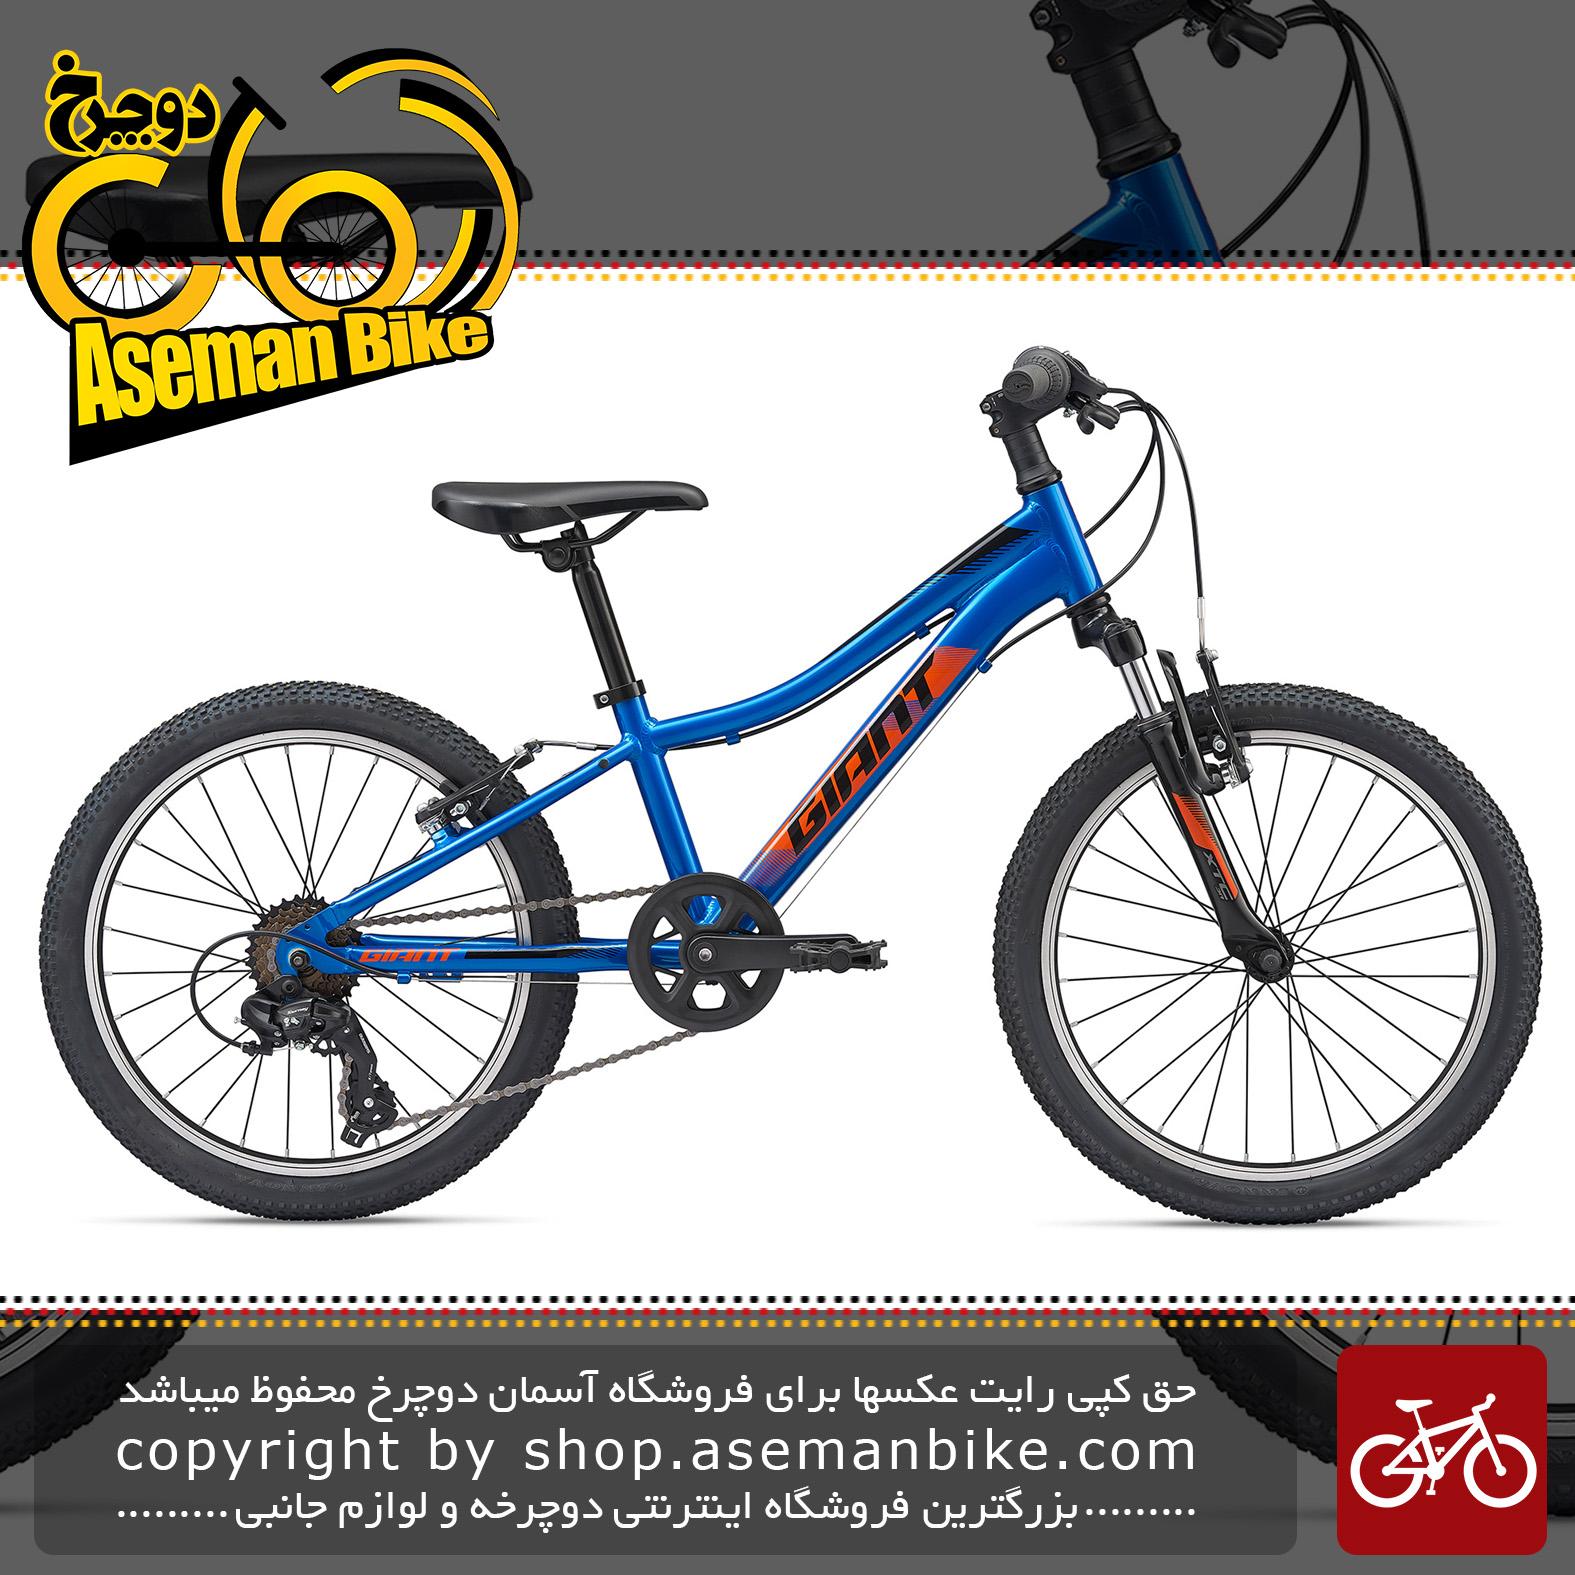 دوچرخه کوهستان جاینت مدل ایکس تی سی جی آر 20 اینچ 2020 Giant Mountain Bicycle XtC Jr 20 2020